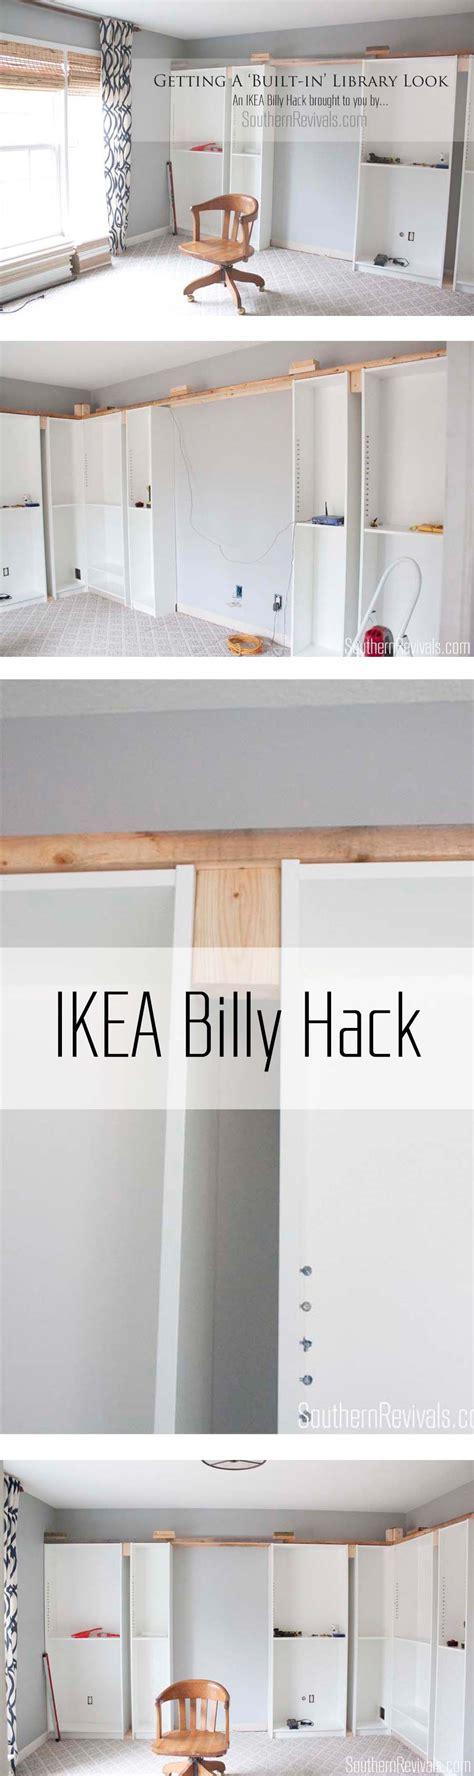 Bibliothek Möbel Ikea by Office Makeover Part 1 Building In Billy Ikea Hack Diy